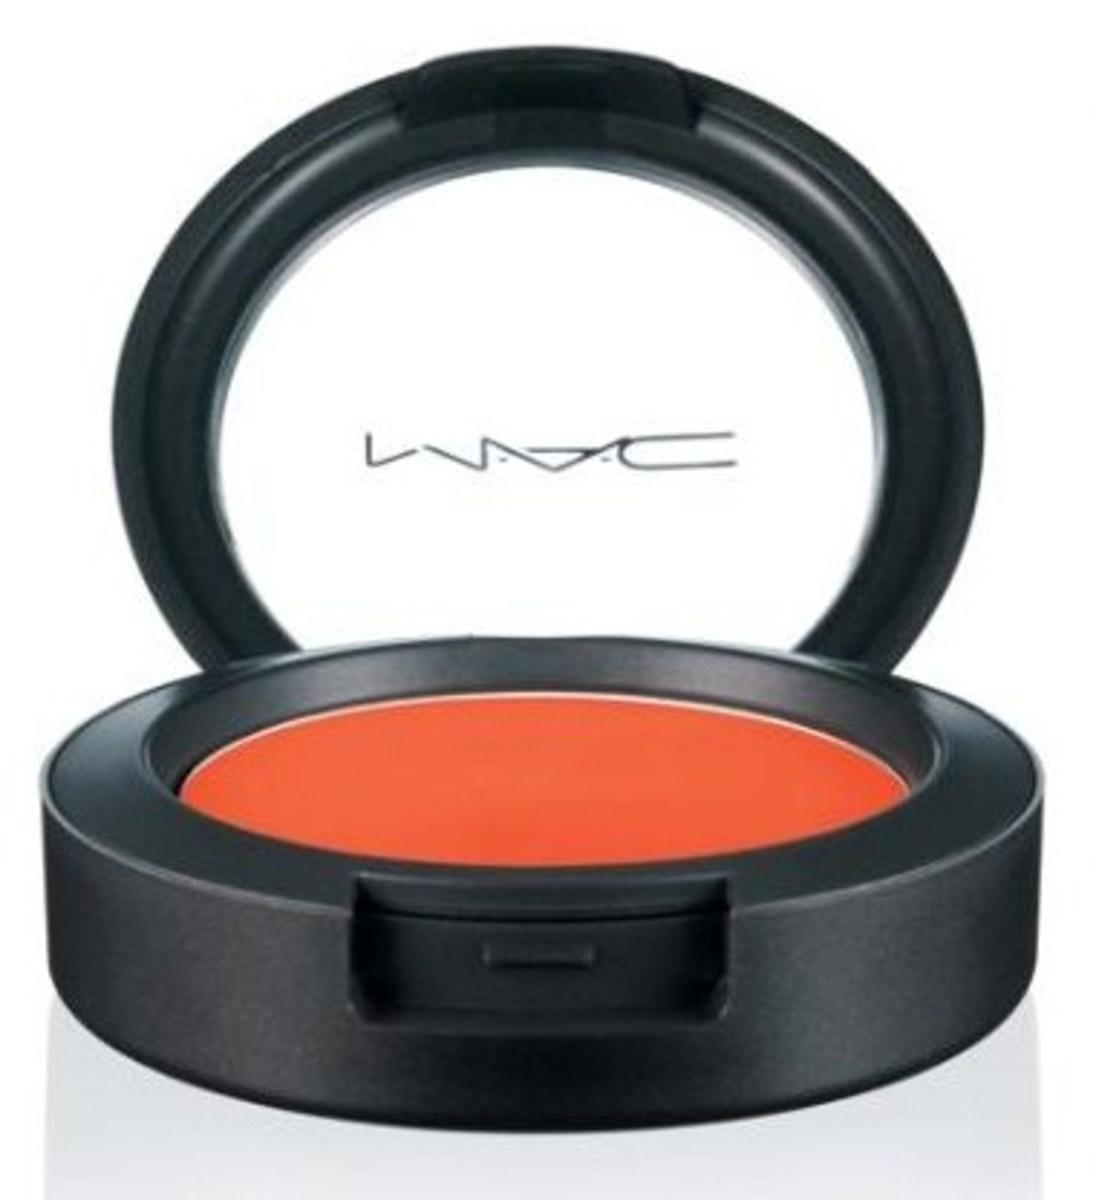 Orange Blush for Olive Skin